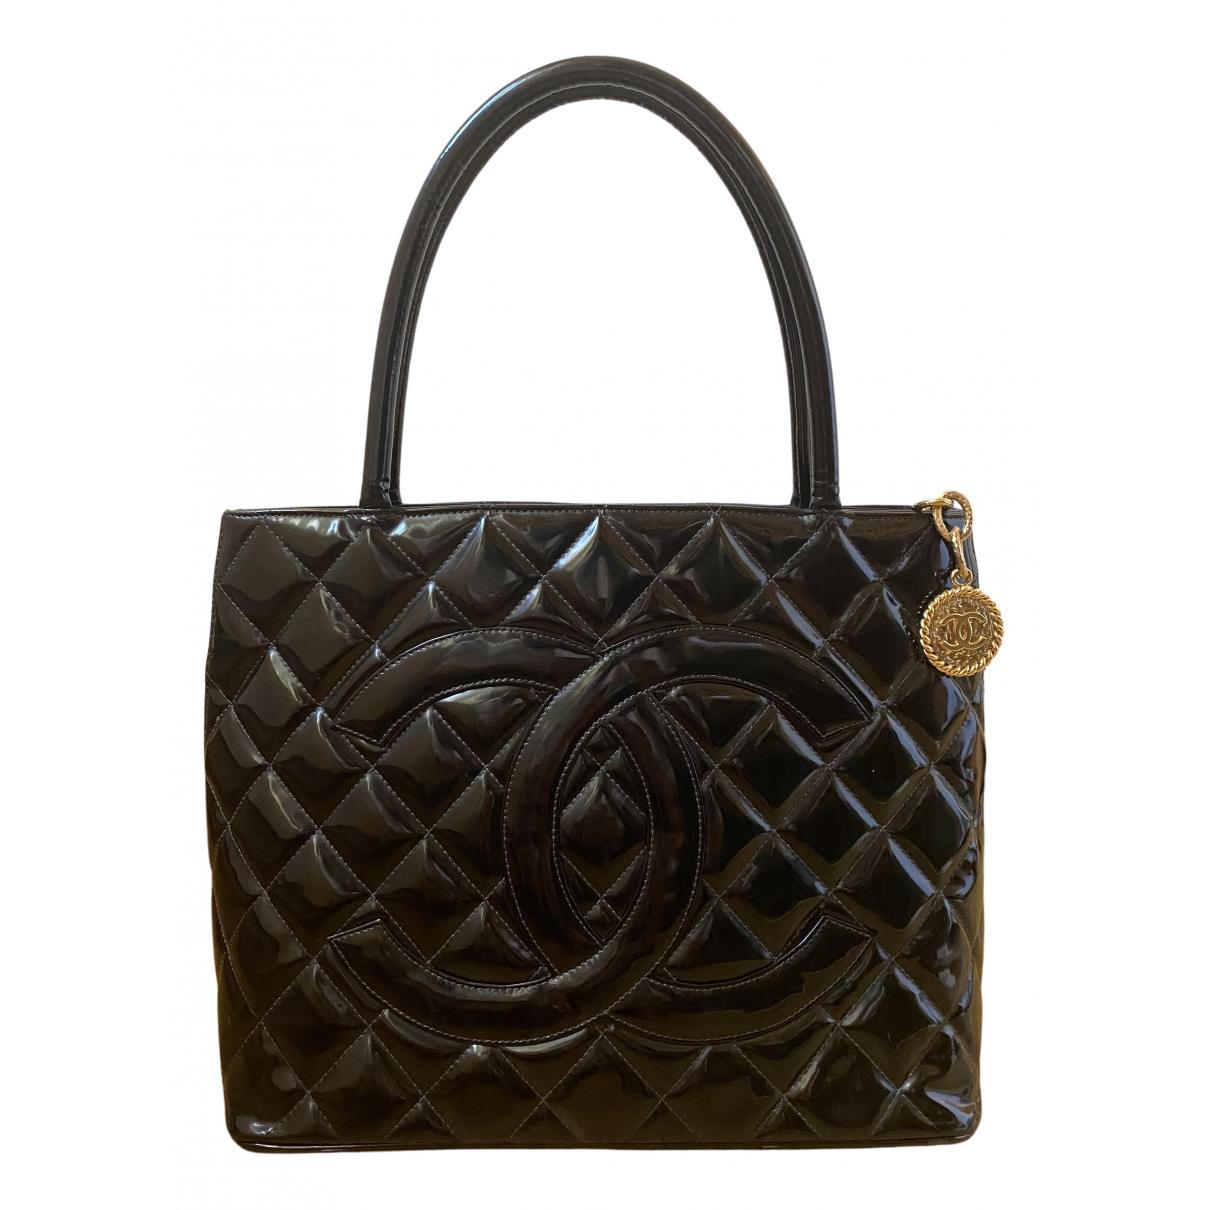 Chanel - Sac a main Medaillon pour femme en cuir verni - noir